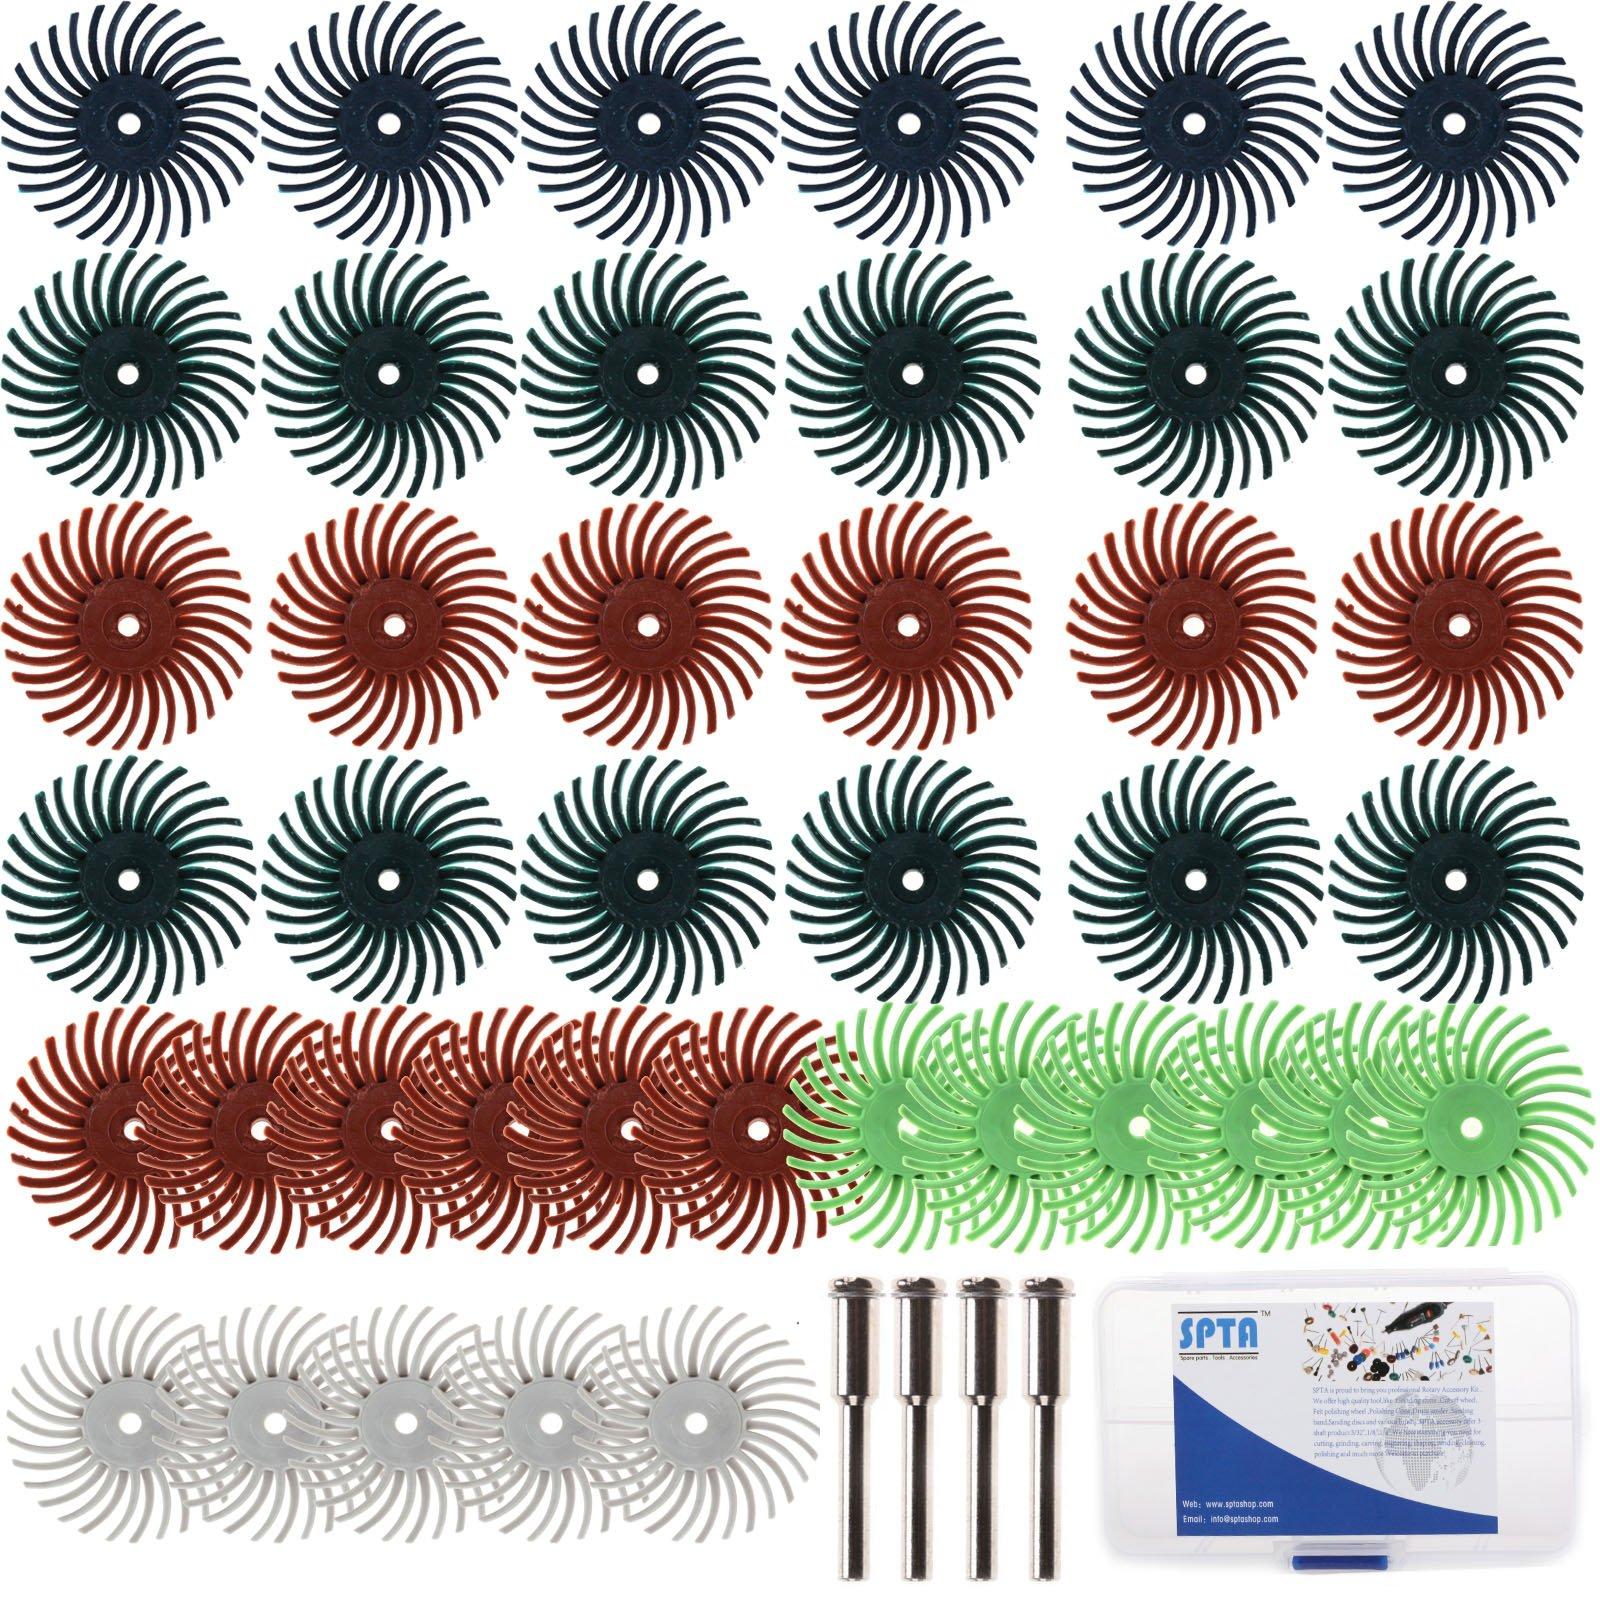 "SPTA 1""(25mm) Dia Mix Grit Radial Bristle Disc & 10 Mandrels (EACH : 3/32"" & 1/8"" SHANK) Kit For Dremel Rotary Tools Pack Of 52Pcs"